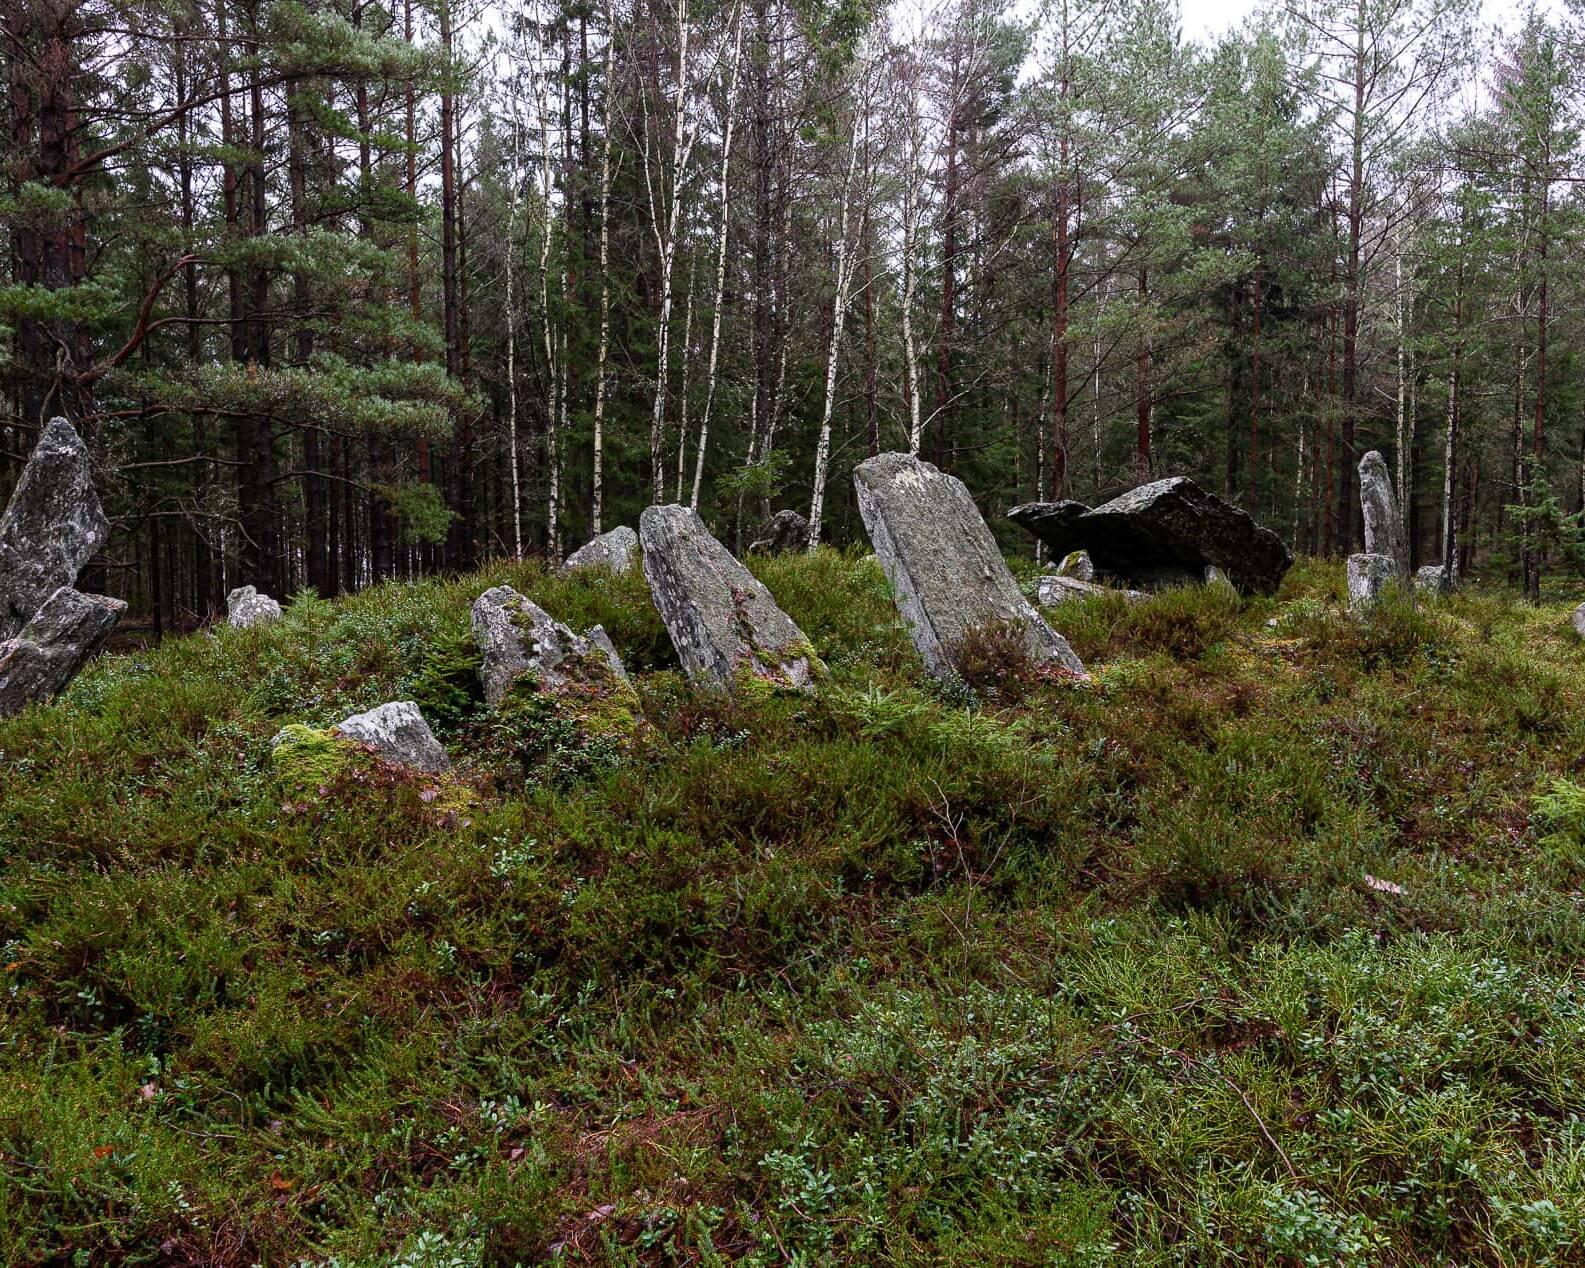 Megalitgraven Torebo Altare på Orust